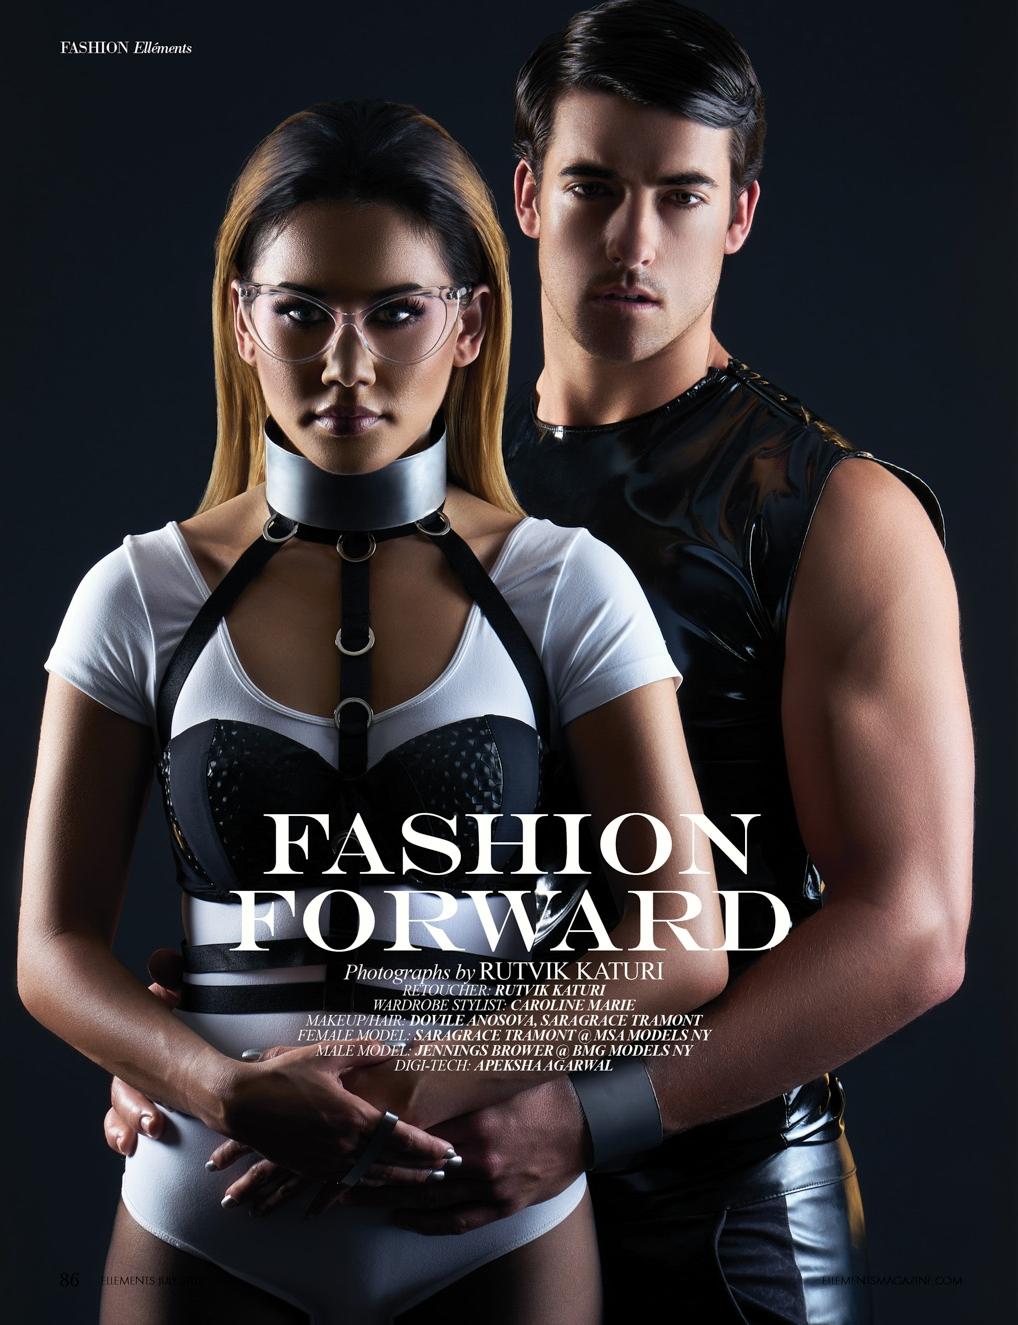 Rutvik Katuri - Fashion Forward: Editorial for Elléments